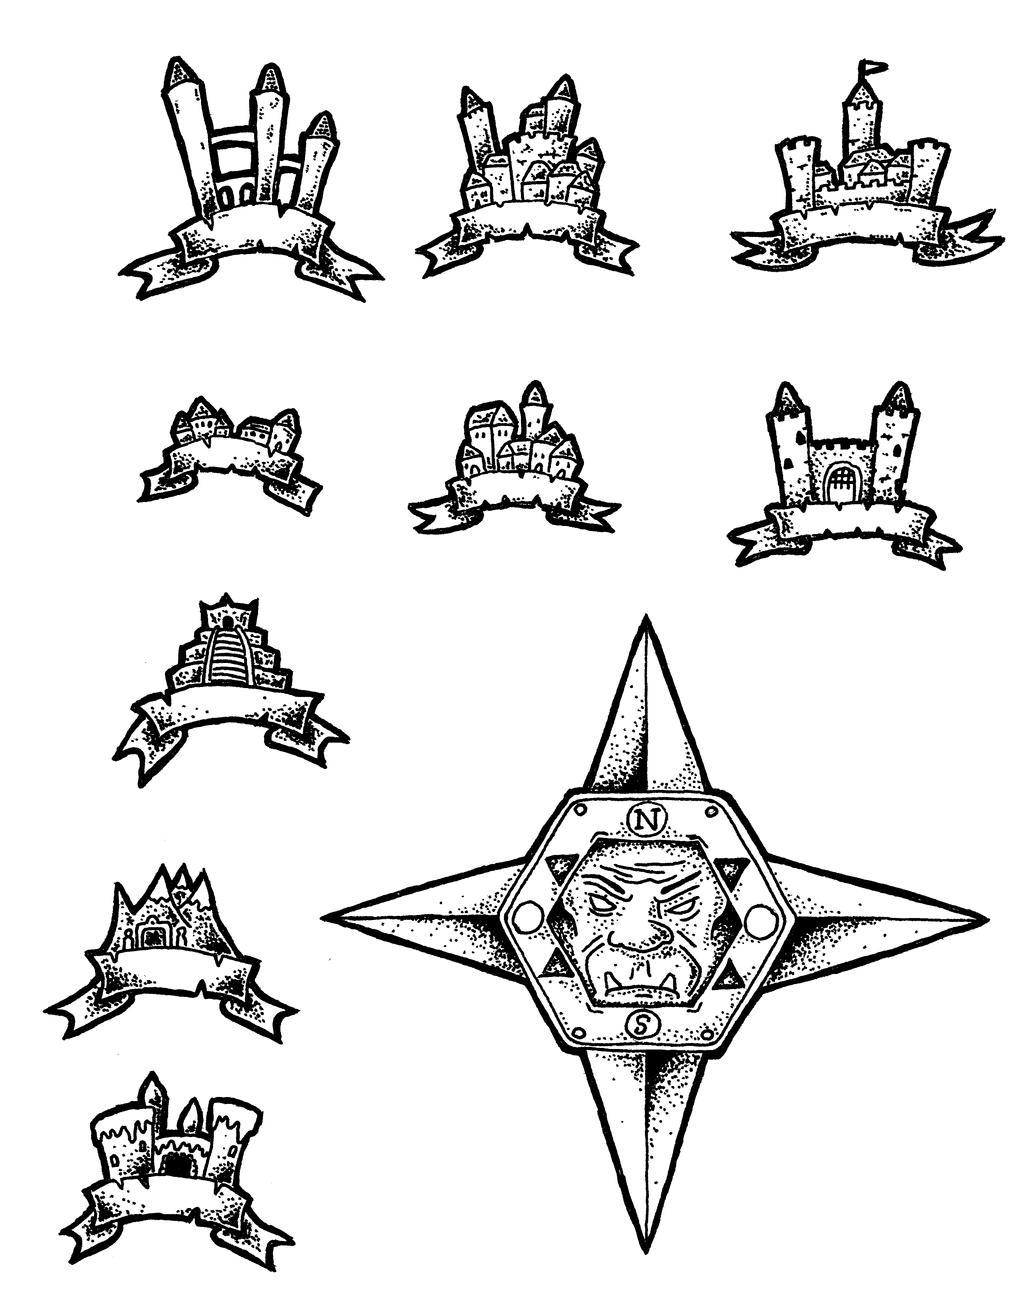 Black And White Overland Map Symbols By Darthasparagus On Deviantart